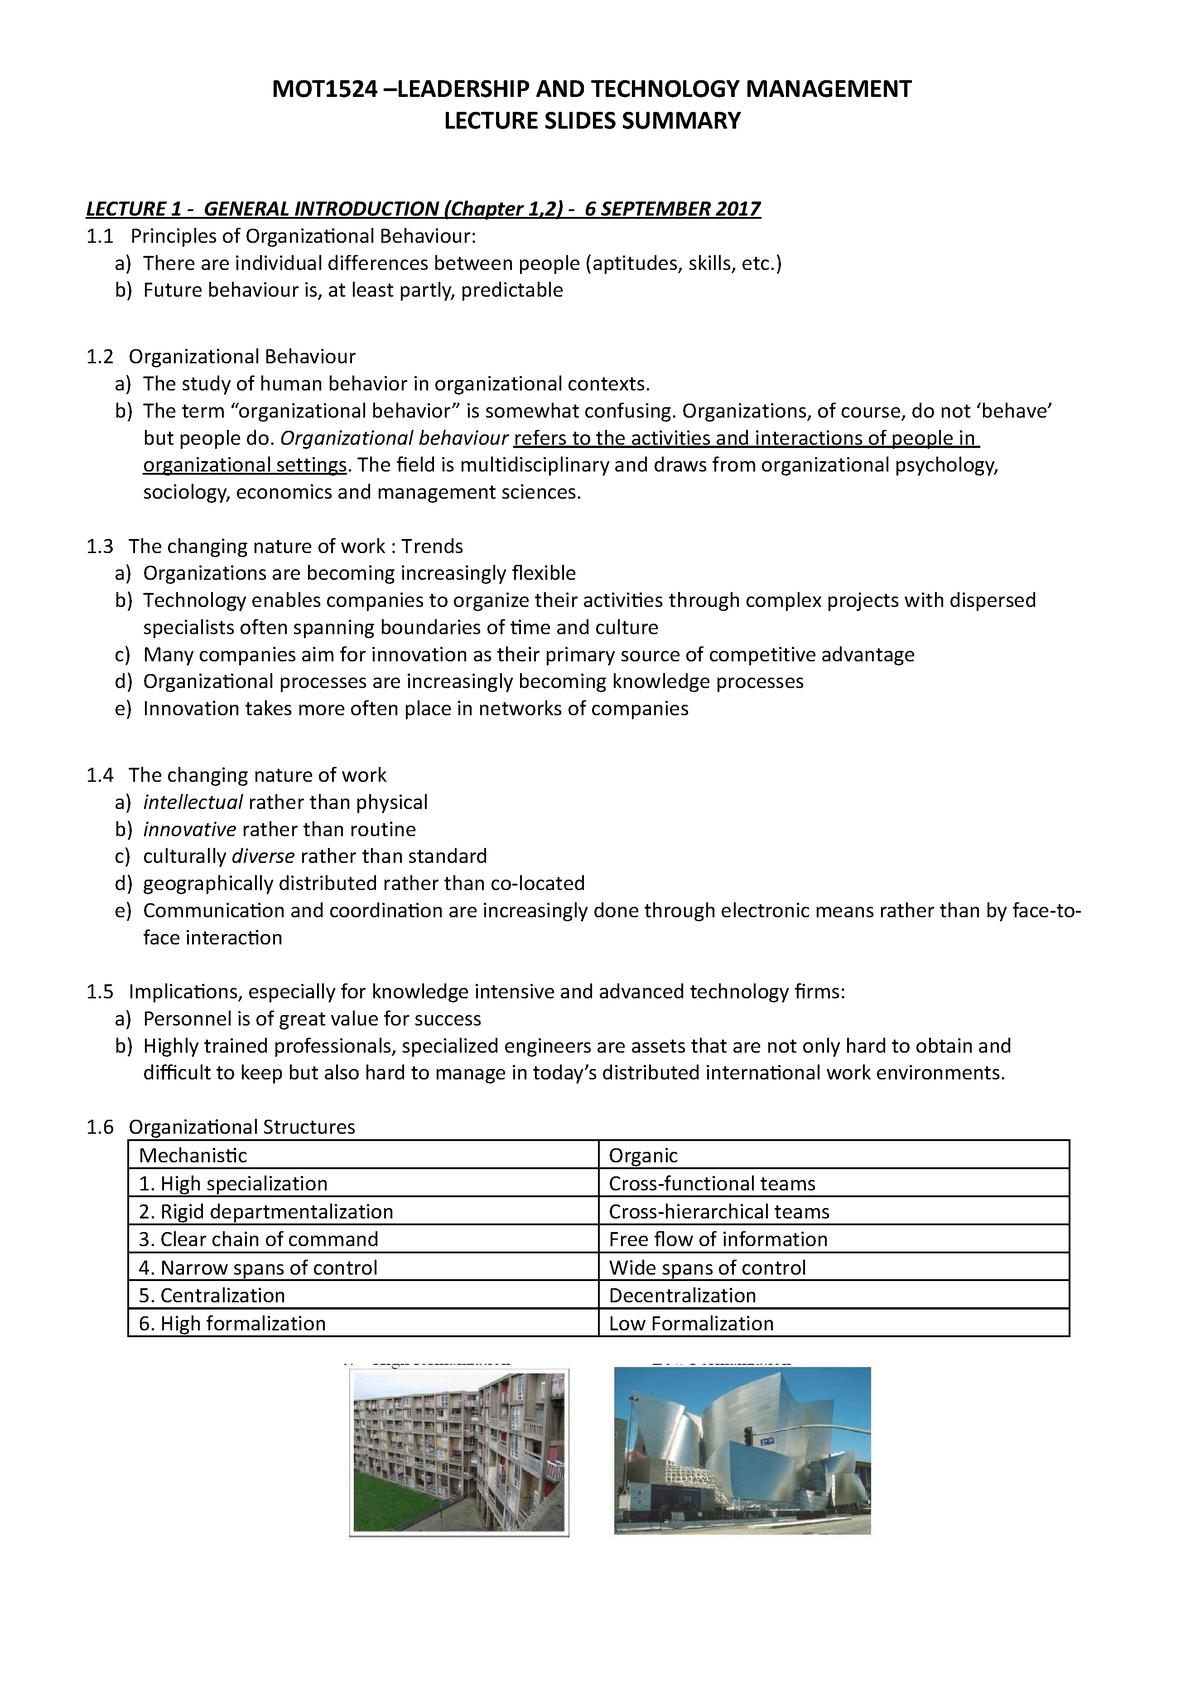 MOT1524 Leadership and Technology Management Slides Summary